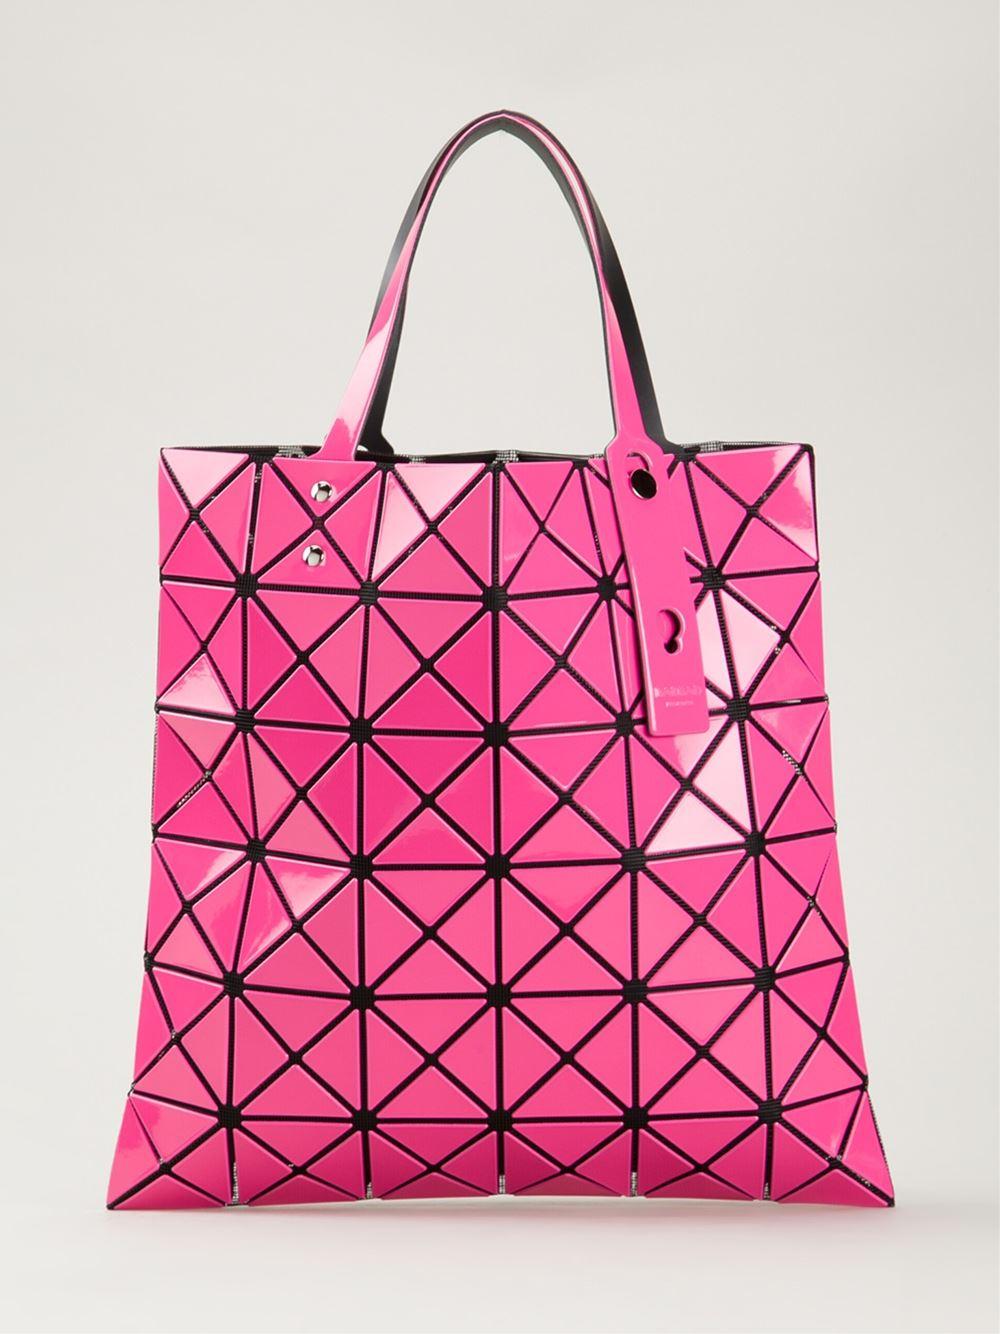 Bao Bao Issey Miyake 'W' Tote in Pink & Purple (Pink)